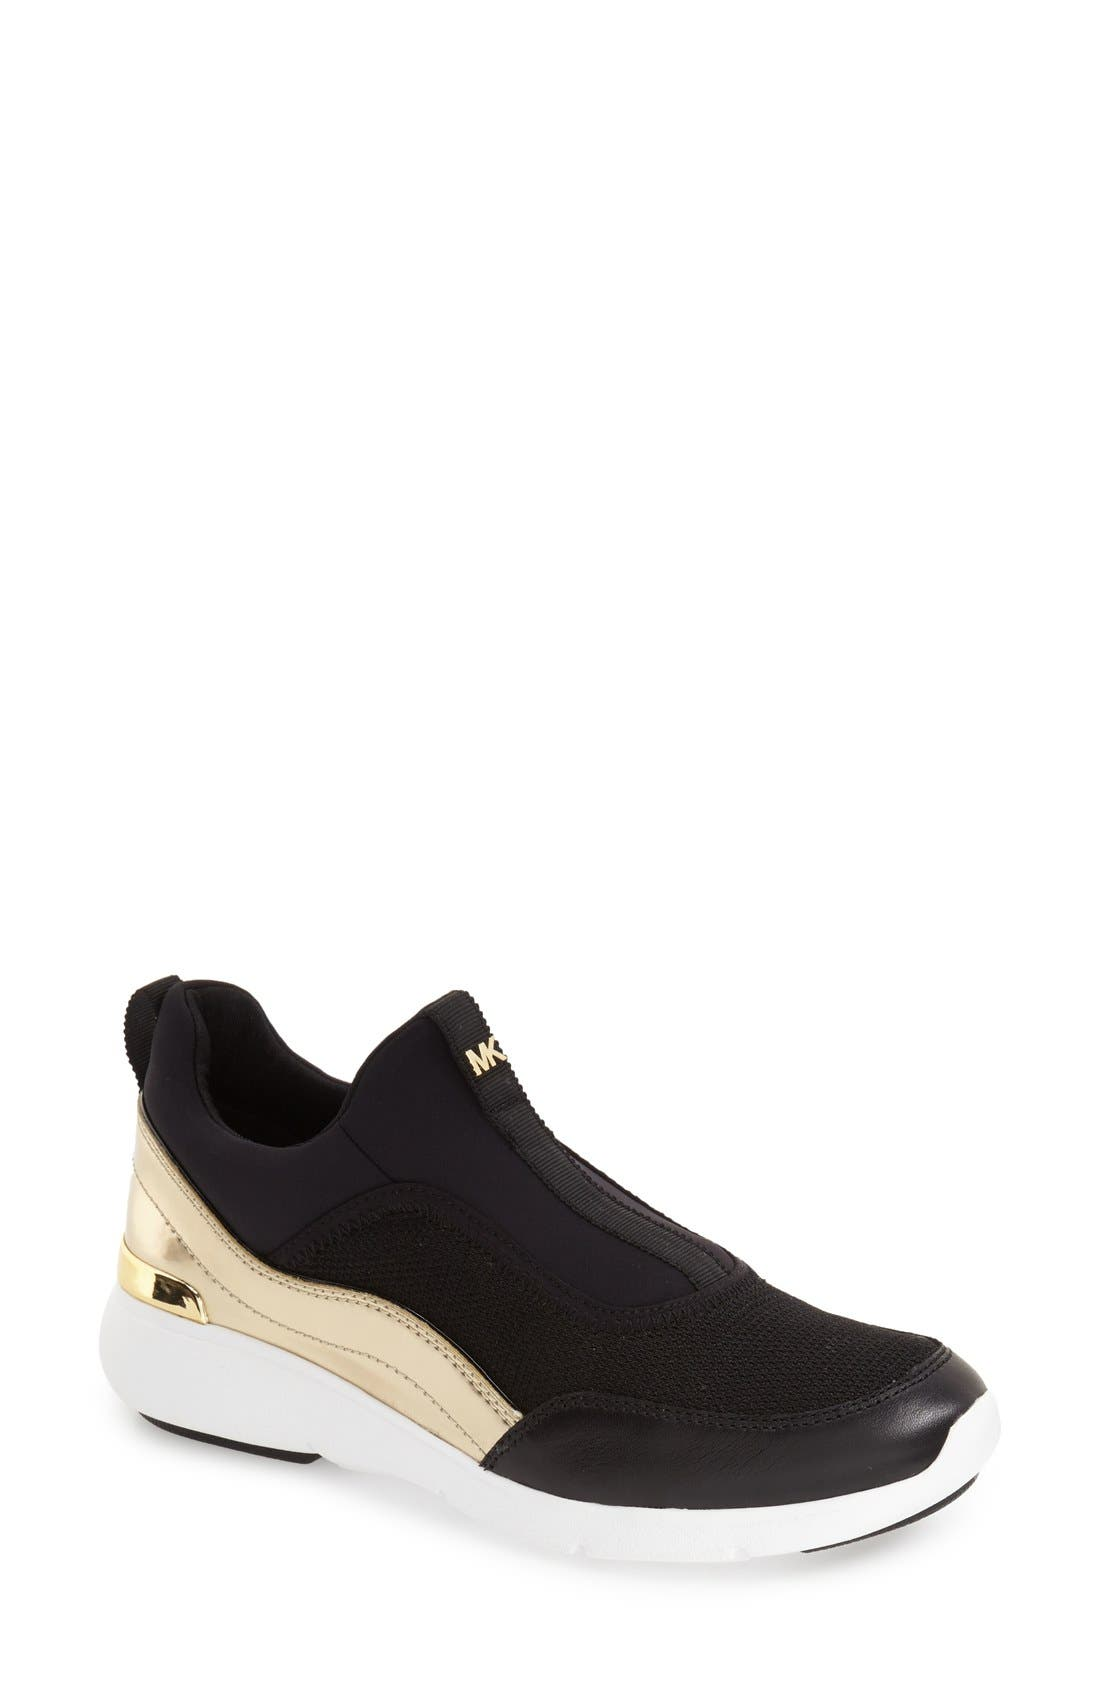 Alternate Image 1 Selected - MICHAEL Michael Kors 'Ace' Sneaker (Women)